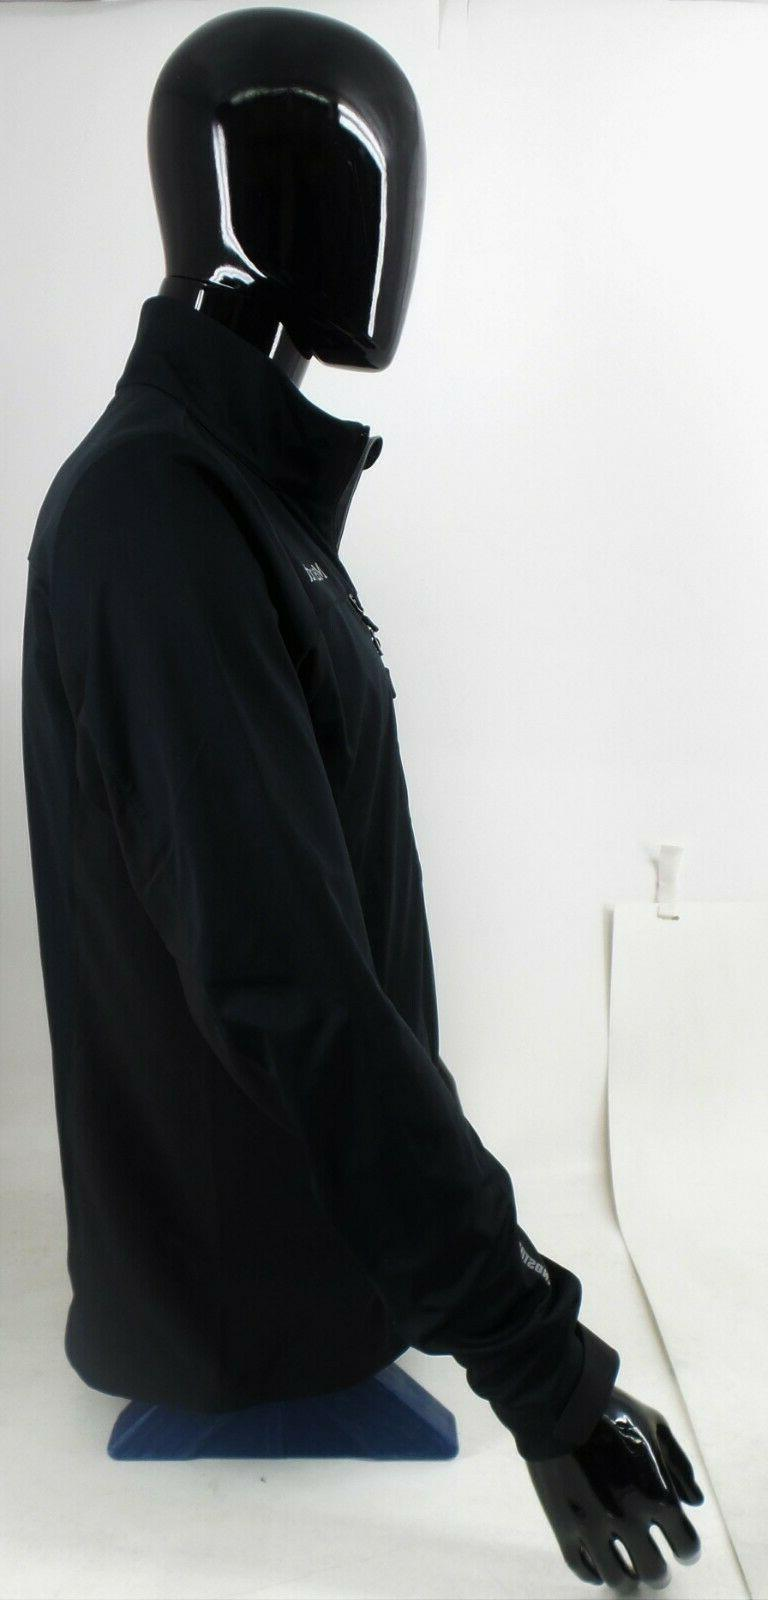 Marmot Black Softshell Gore-Tex Coat - Select